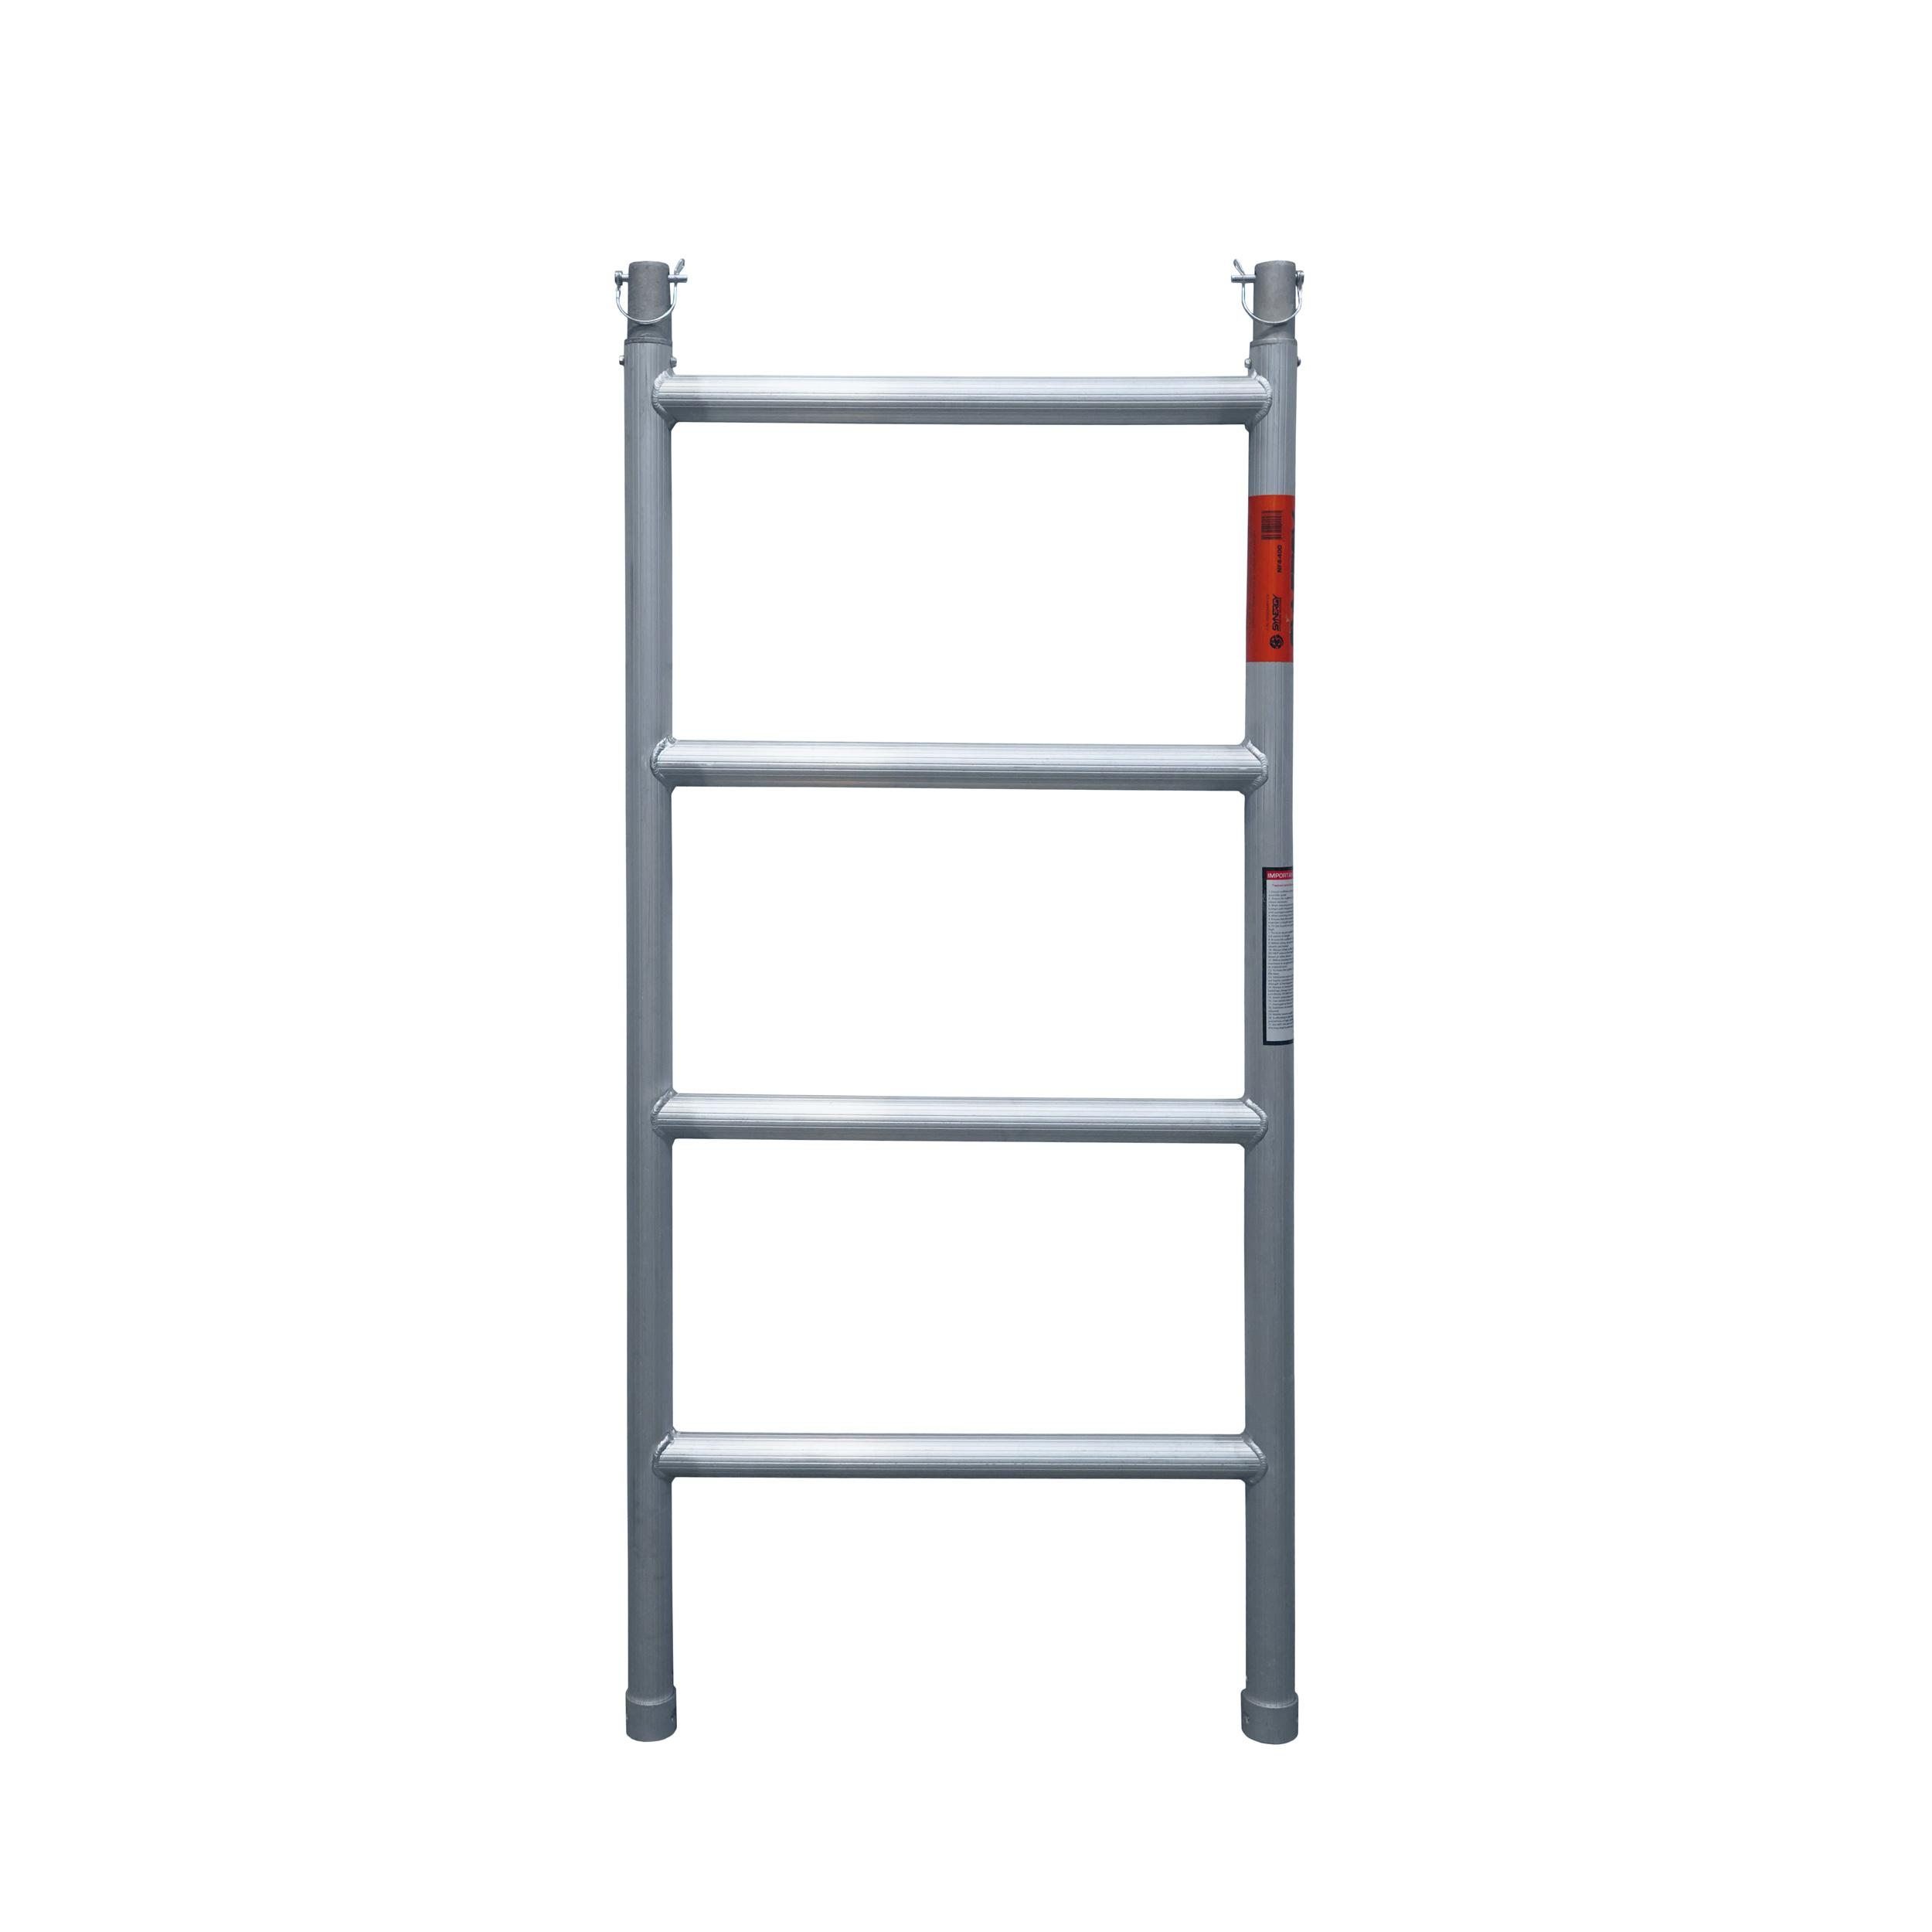 Aluminium Mobile Narrow Scaffold 3.0m - 3.4m (Platform Height)